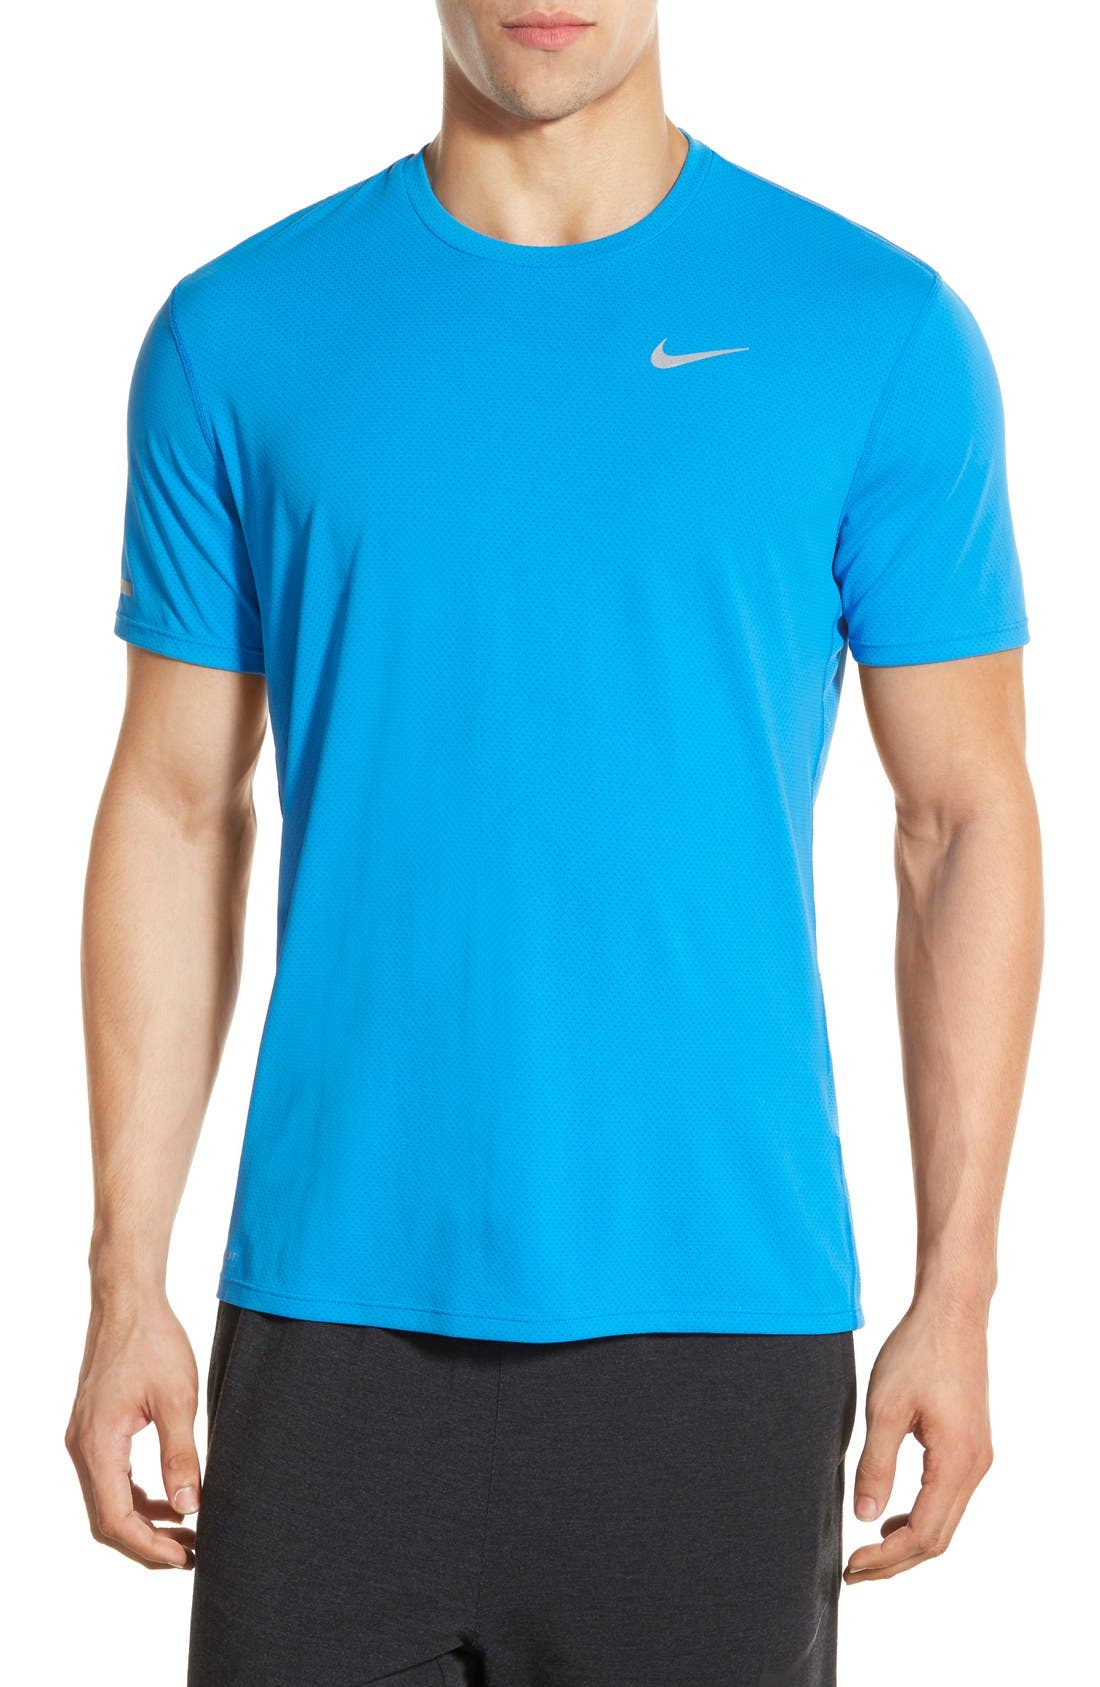 Main Image - Nike 'Contour' Mesh Dri-FIT Running T-Shirt